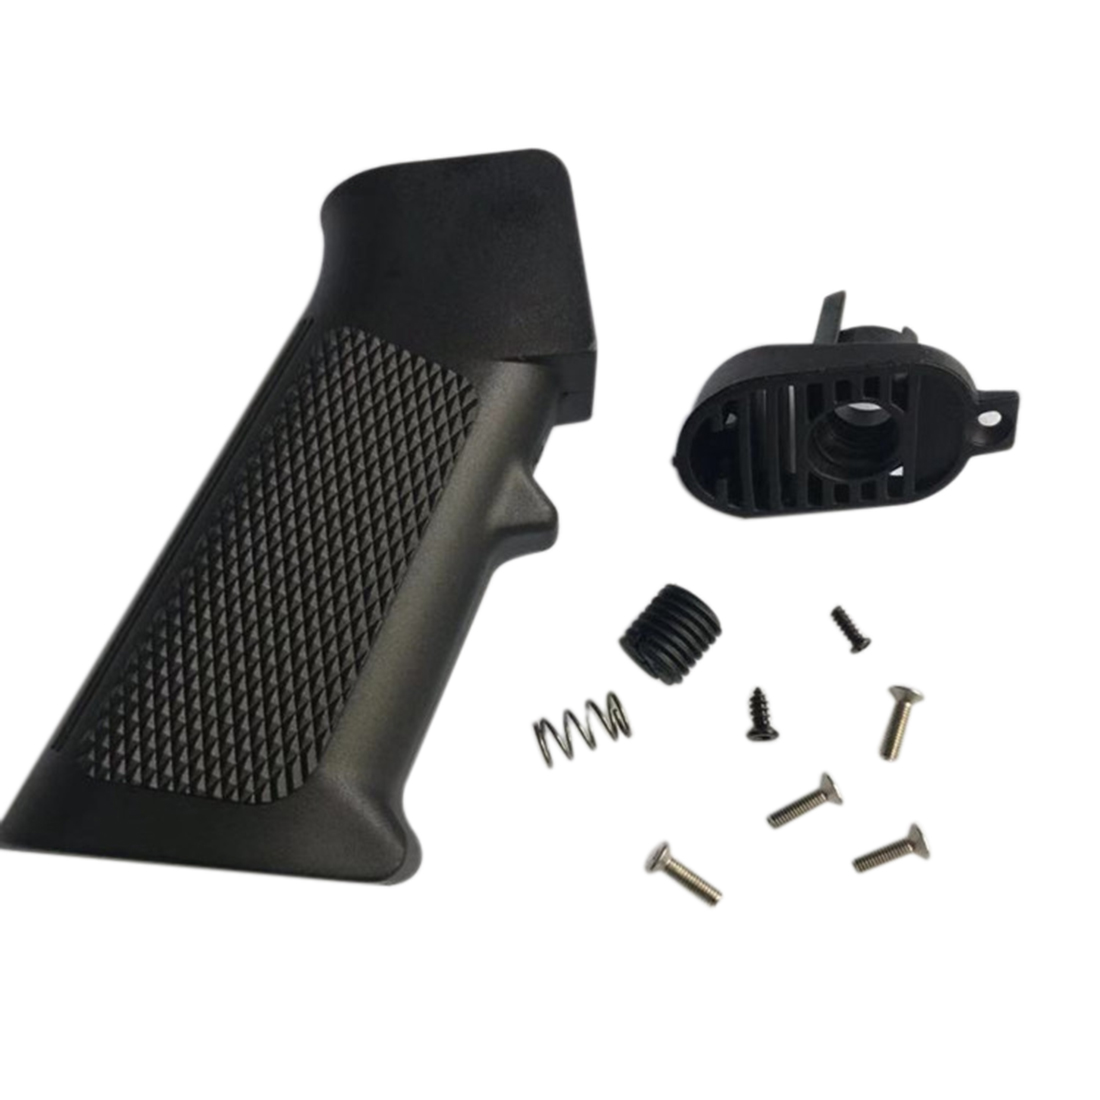 Original Nylon Grip for JM Gen 9 M4A1 Gel Blaster - Black